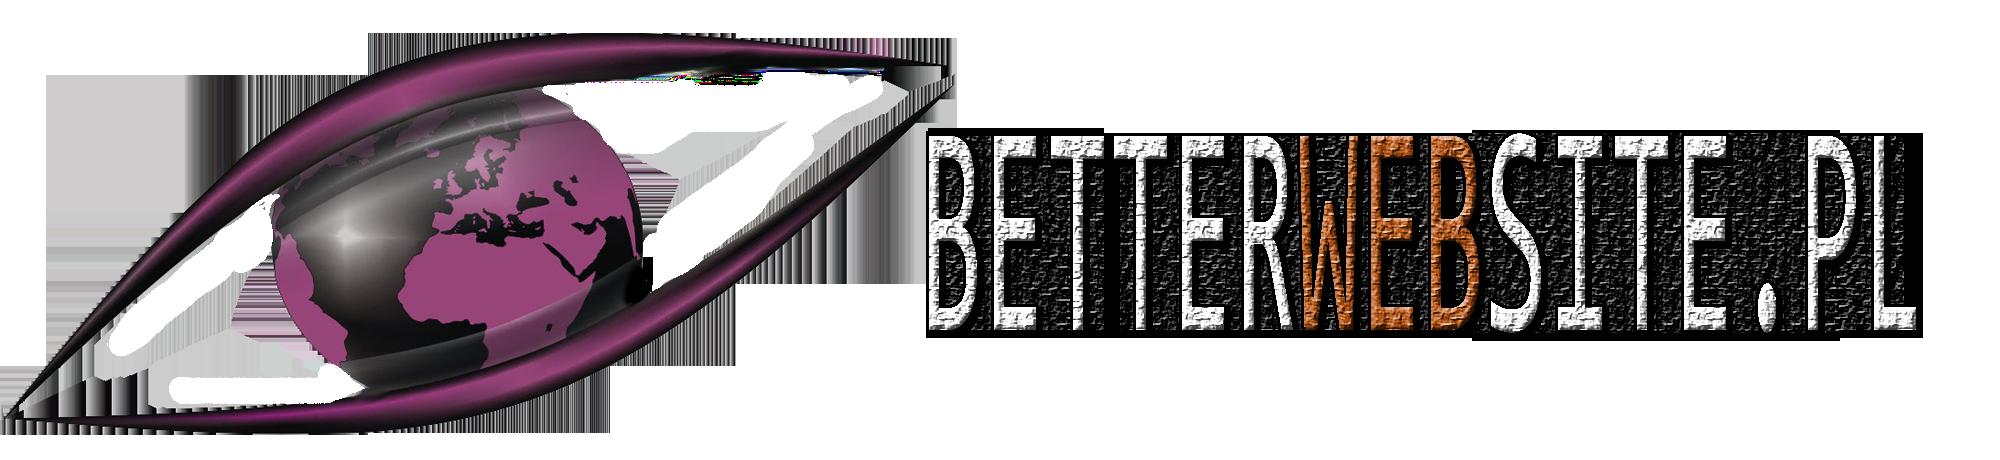 Betterwebsite.pl Strony internetowe